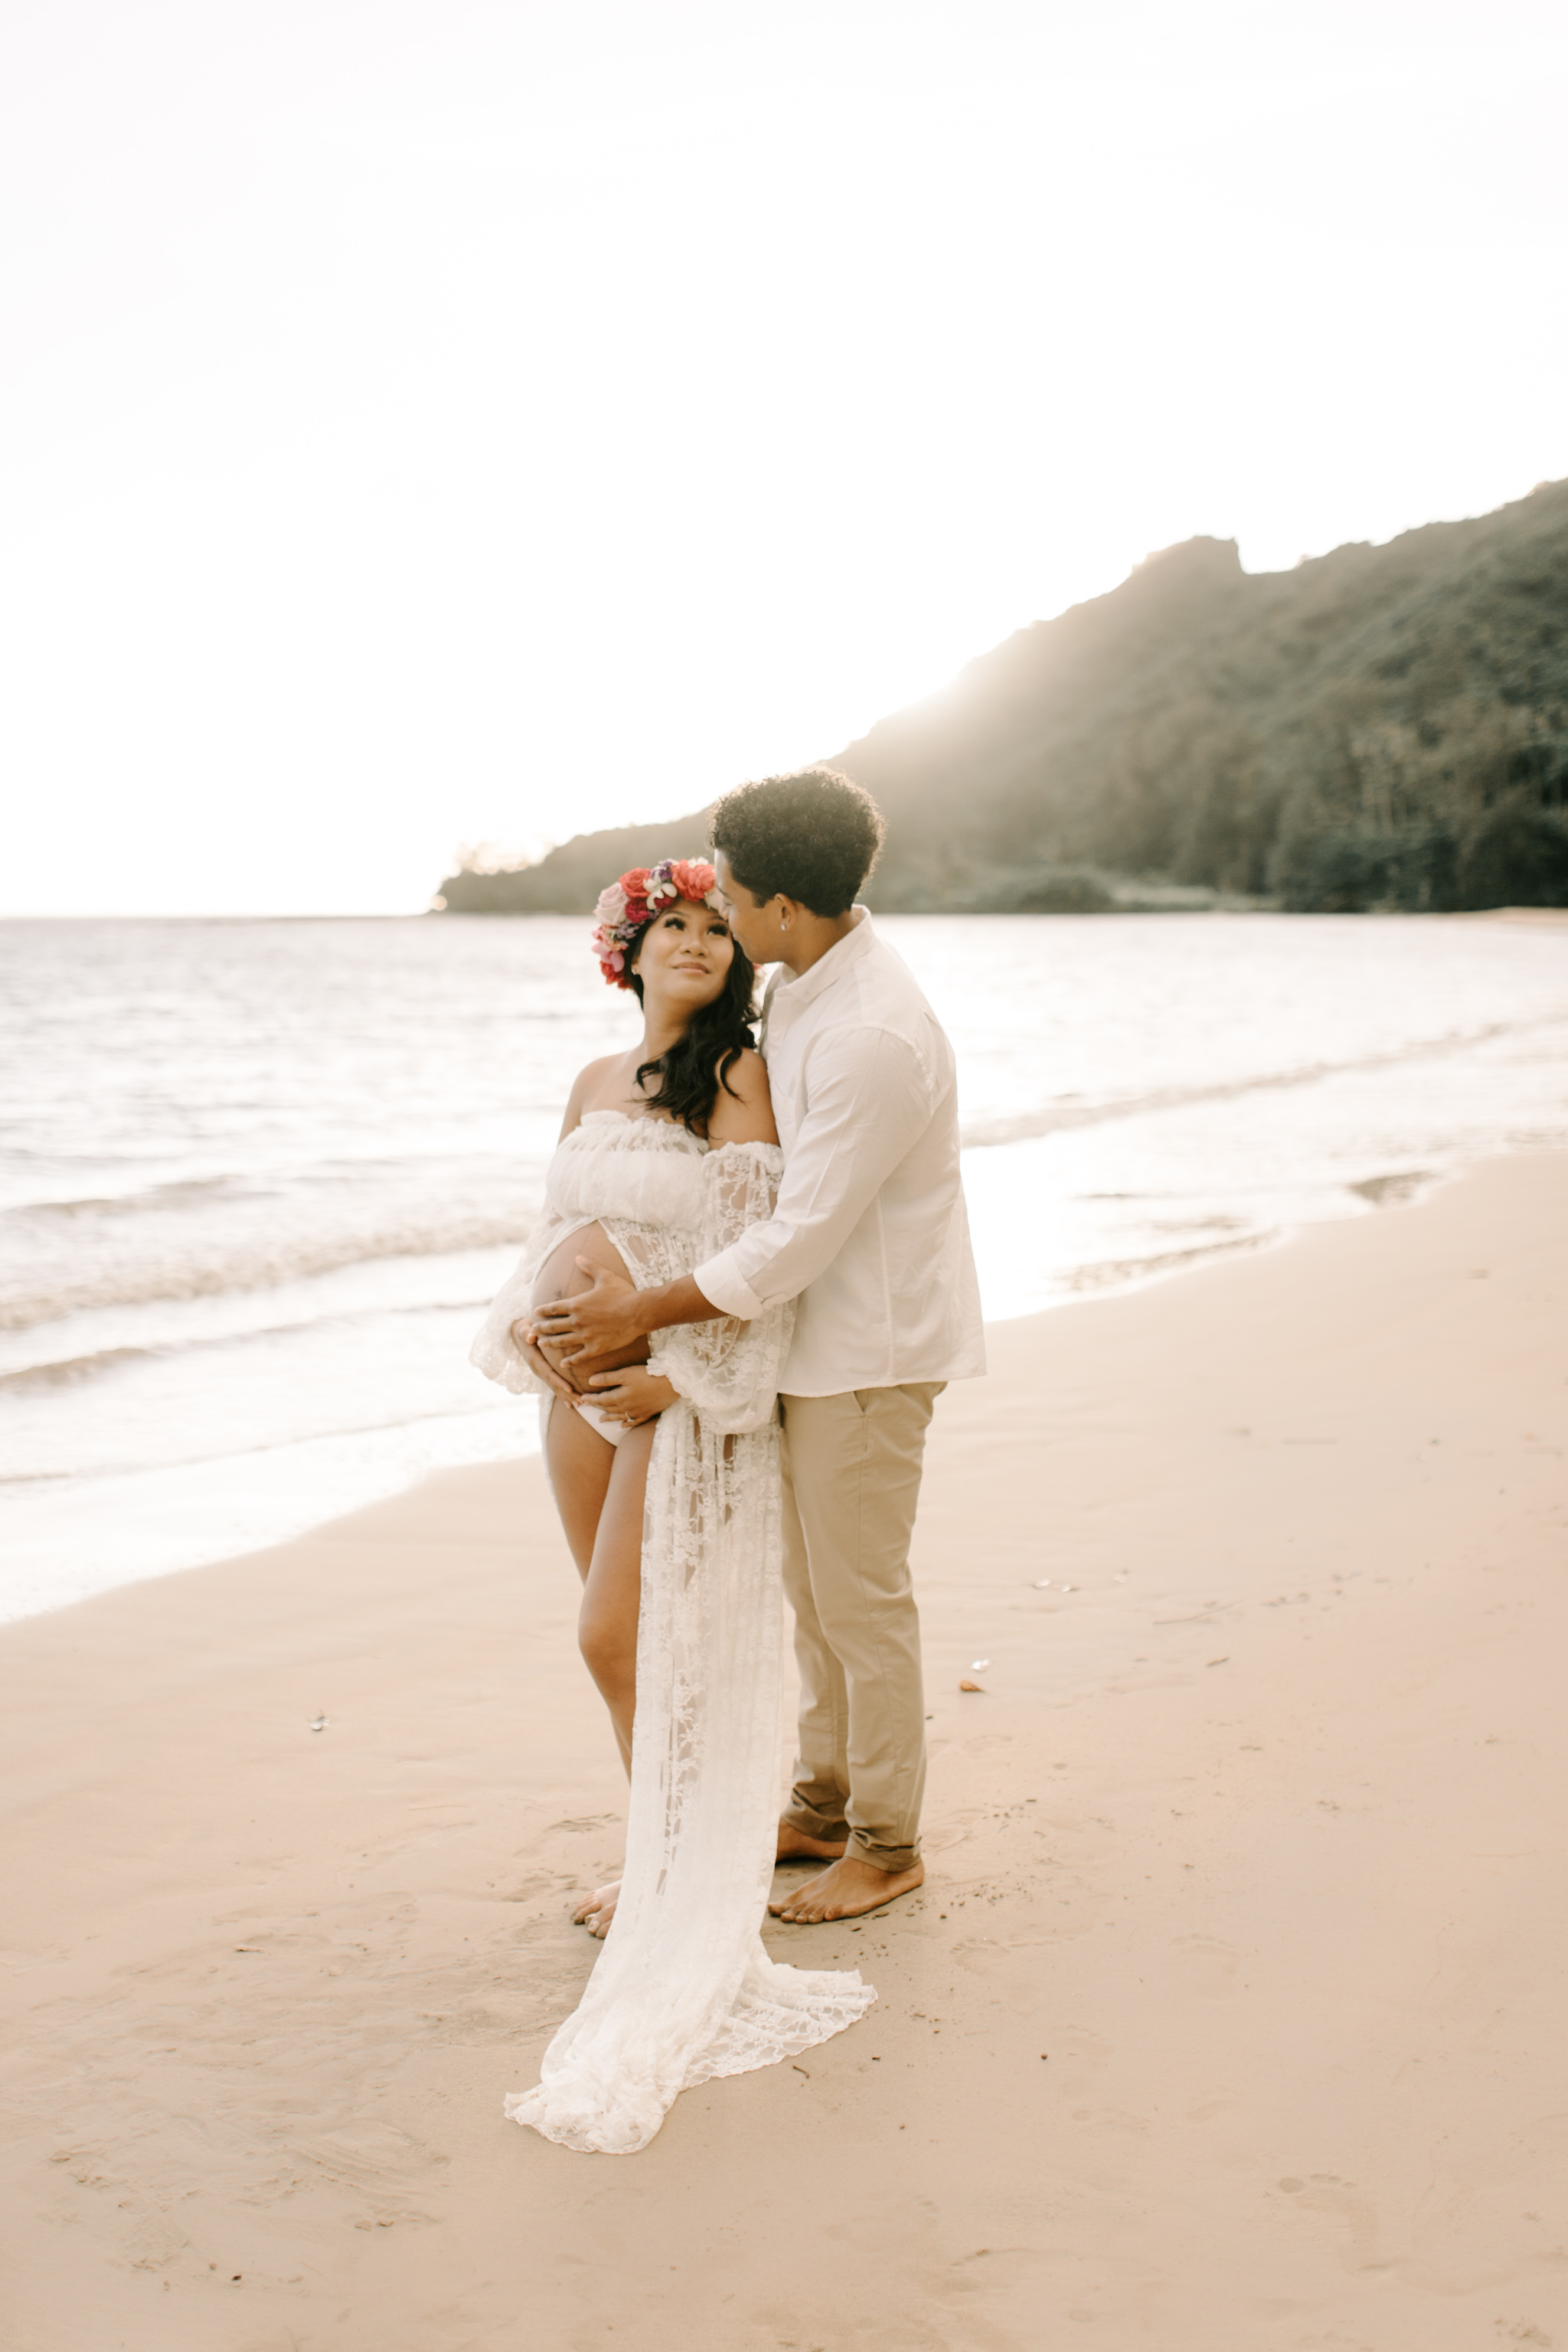 Beautiful Kahana Bay Oahu Sunrise Maternity Session By Hawaii Family Photographer Desiree Leilani